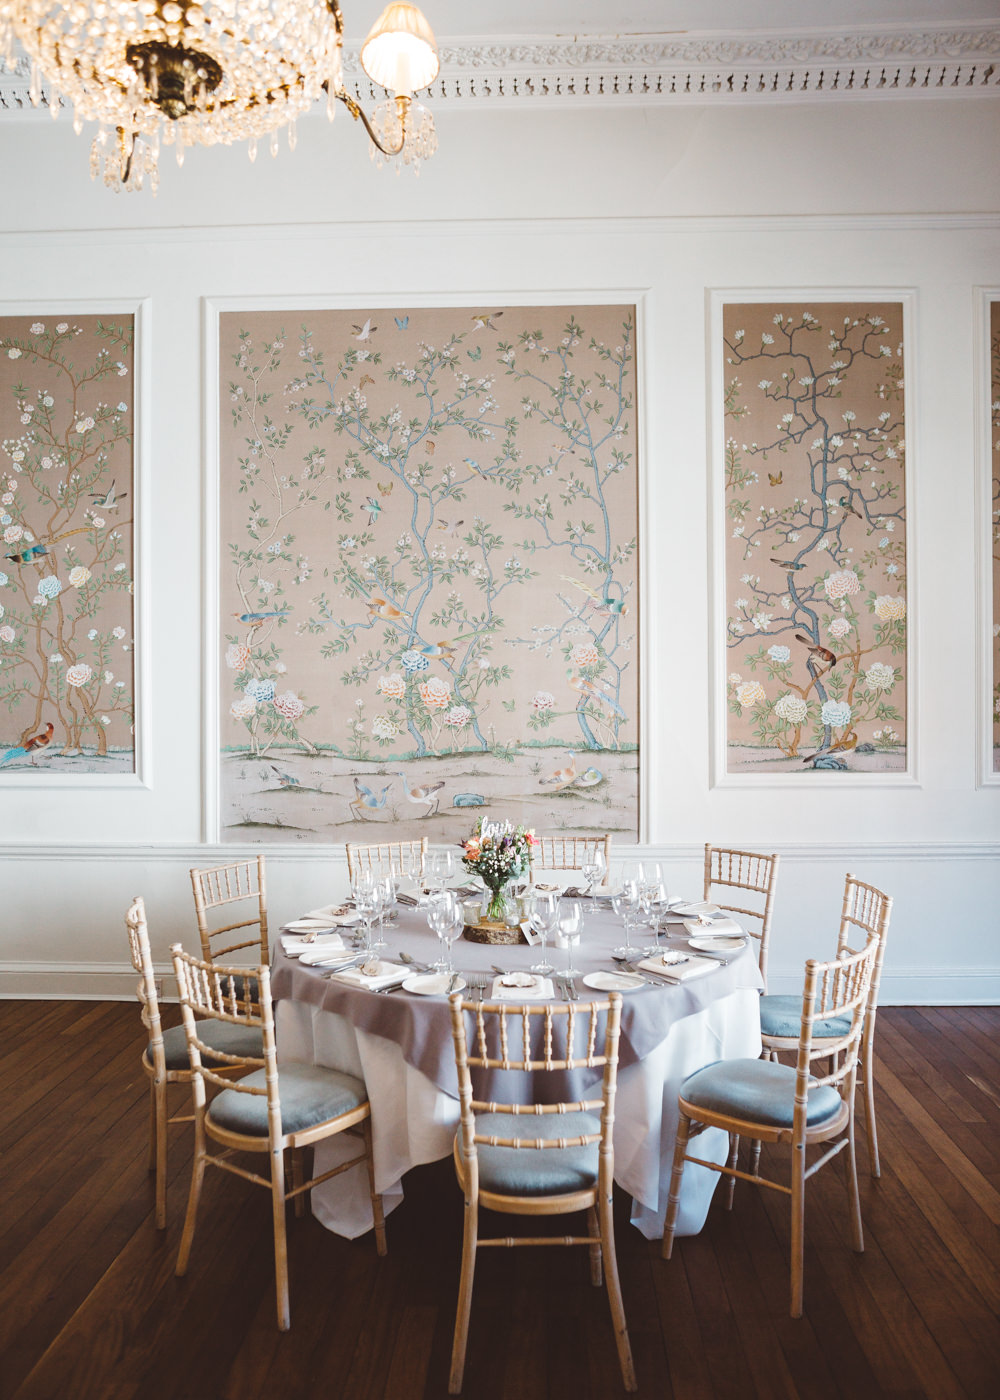 Table Grey Tablecloth Chiavari Chairs Round George Rye Wedding Hollie Carlin Photography